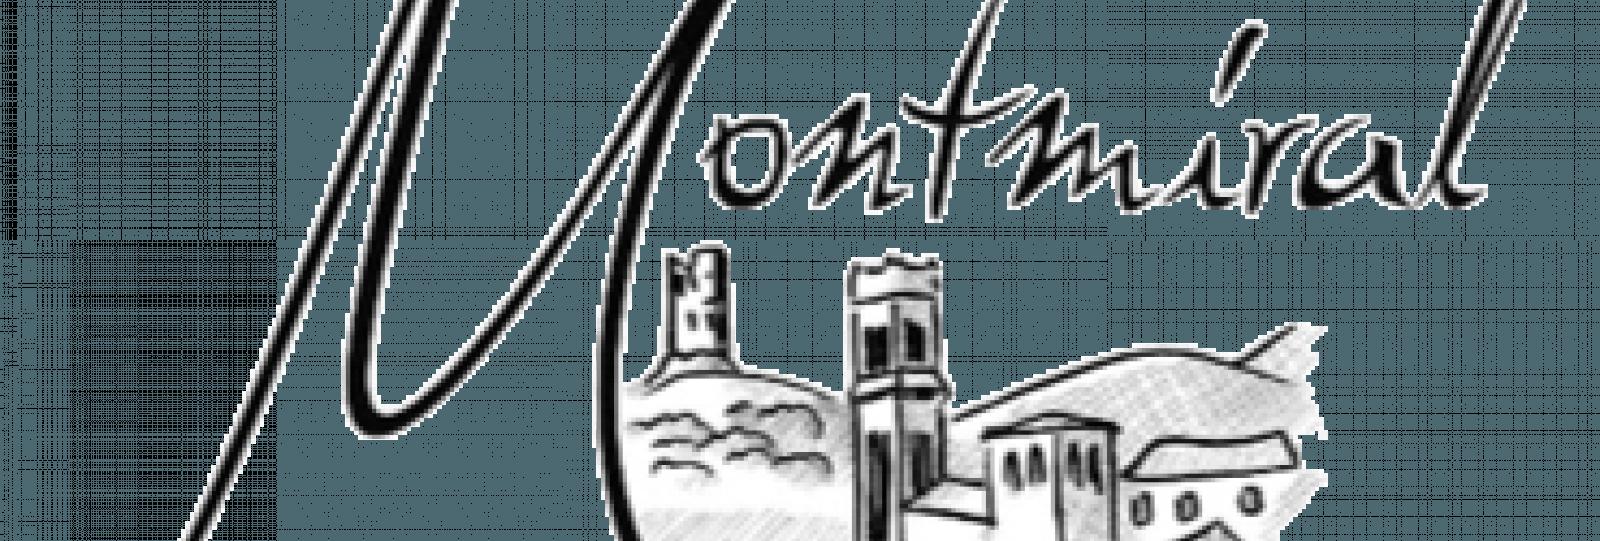 Etang de Montmiral